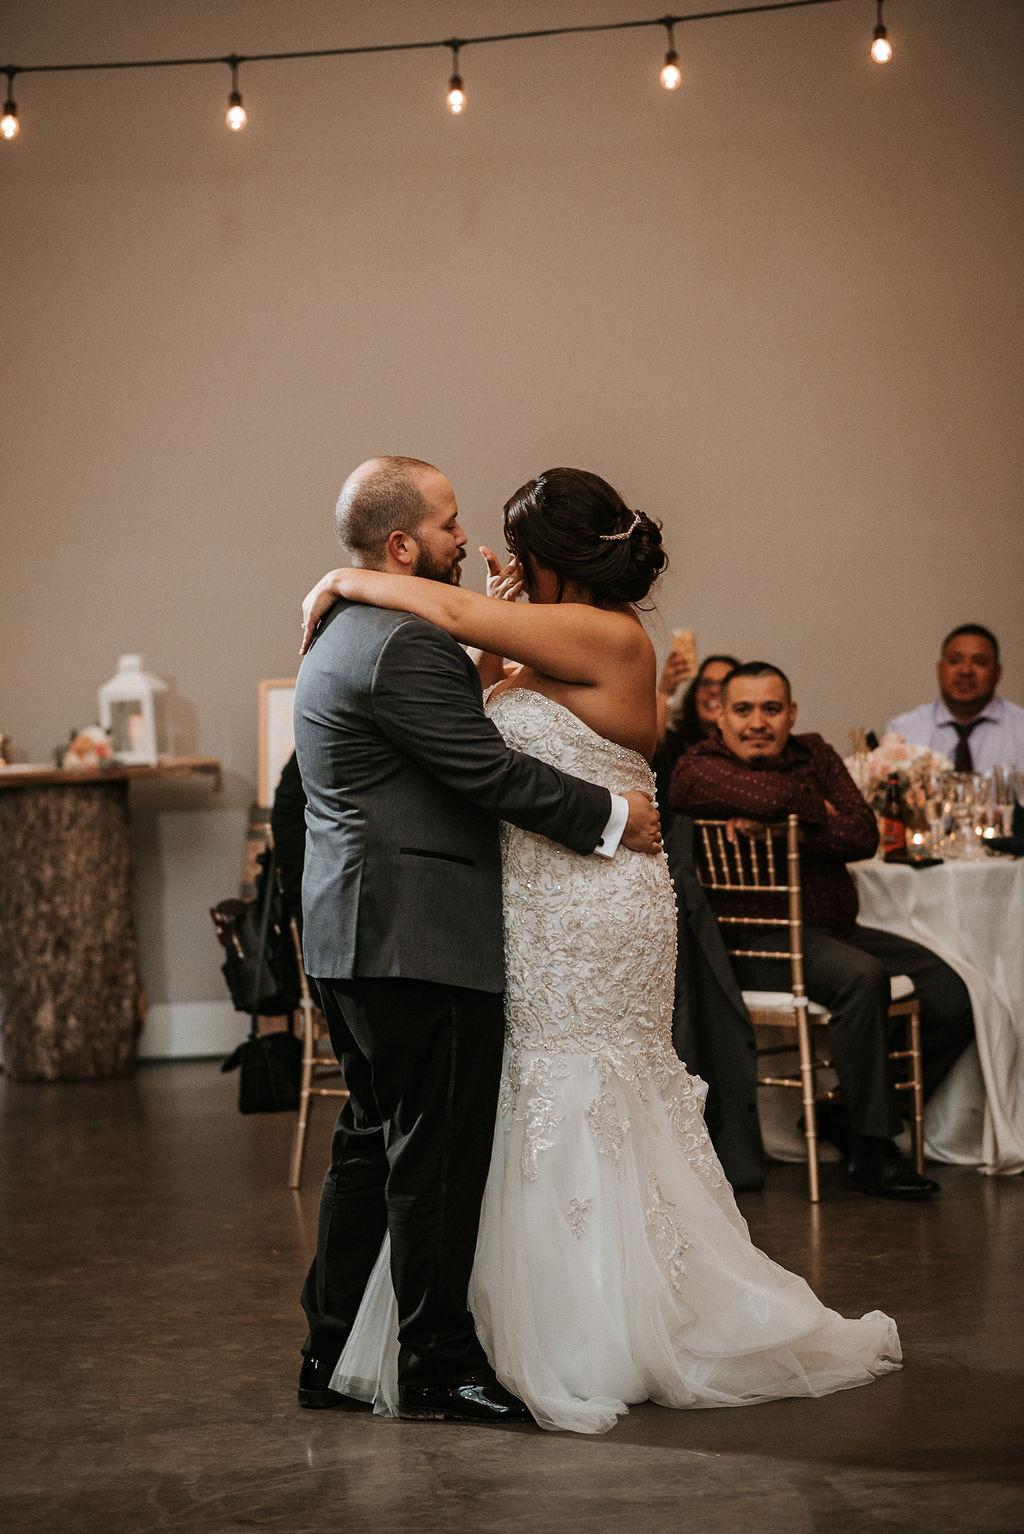 Bride and Groom dancing at reception at Blue Valley Vineyard